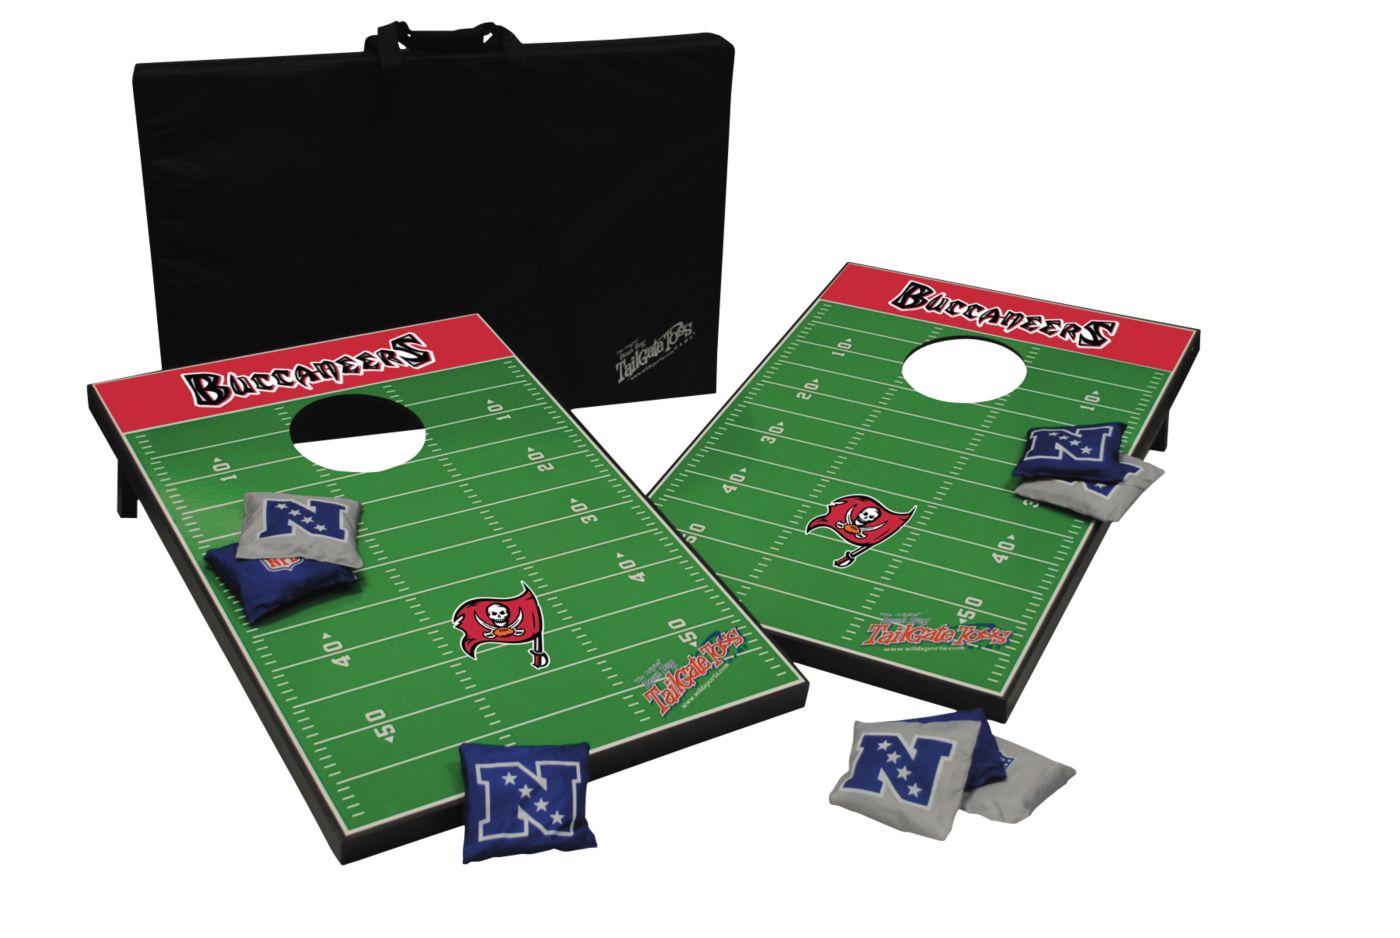 Wild Sports 2' x 3' Tampa Bay Buccaneers Tailgate Bean Bag Toss